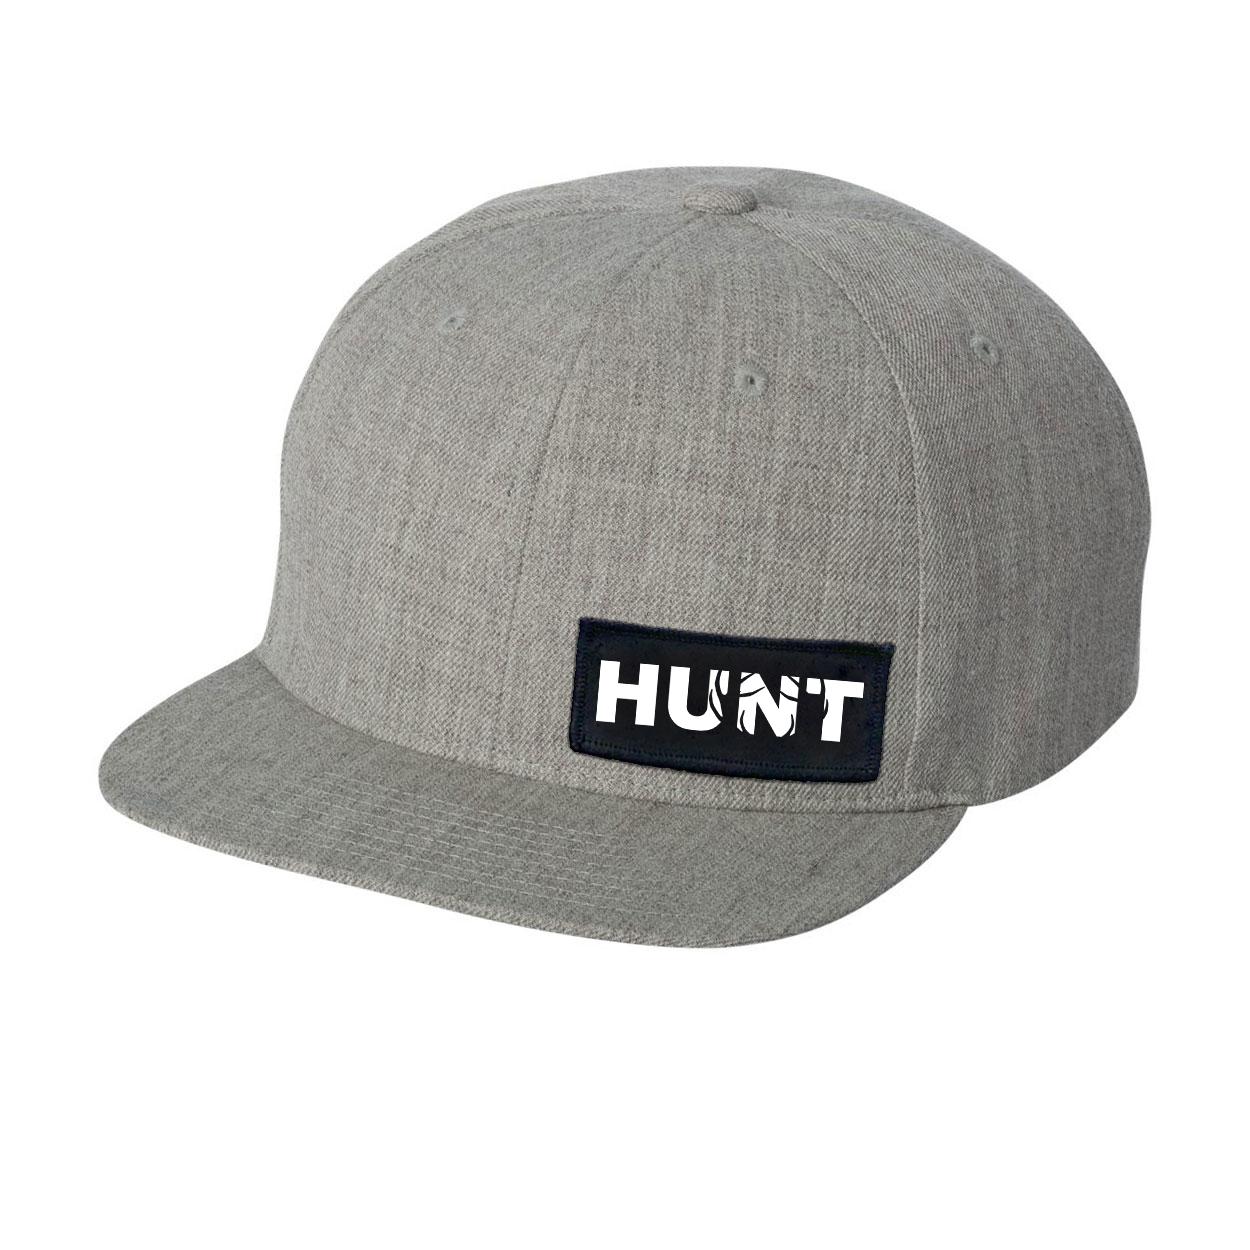 Hunt Rack Logo Night Out Woven Patch Flat Brim Snapback Hat Heather Gray (White Logo)